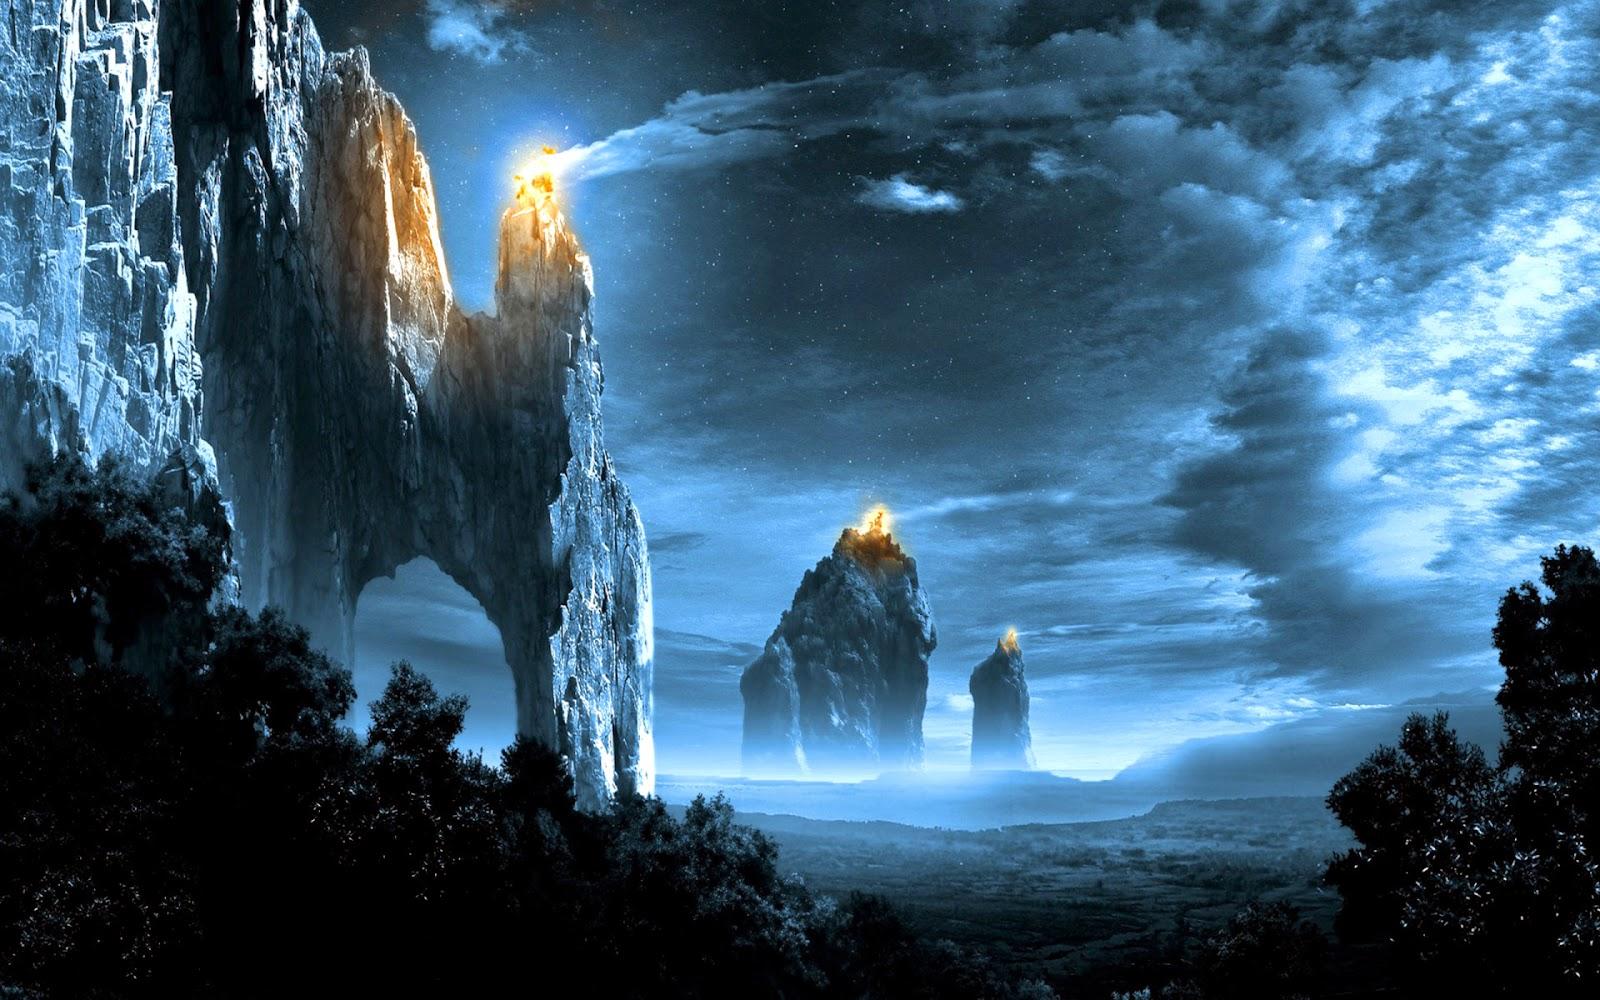 Immagini di paesaggi fantastici for Immagini paesaggi hd